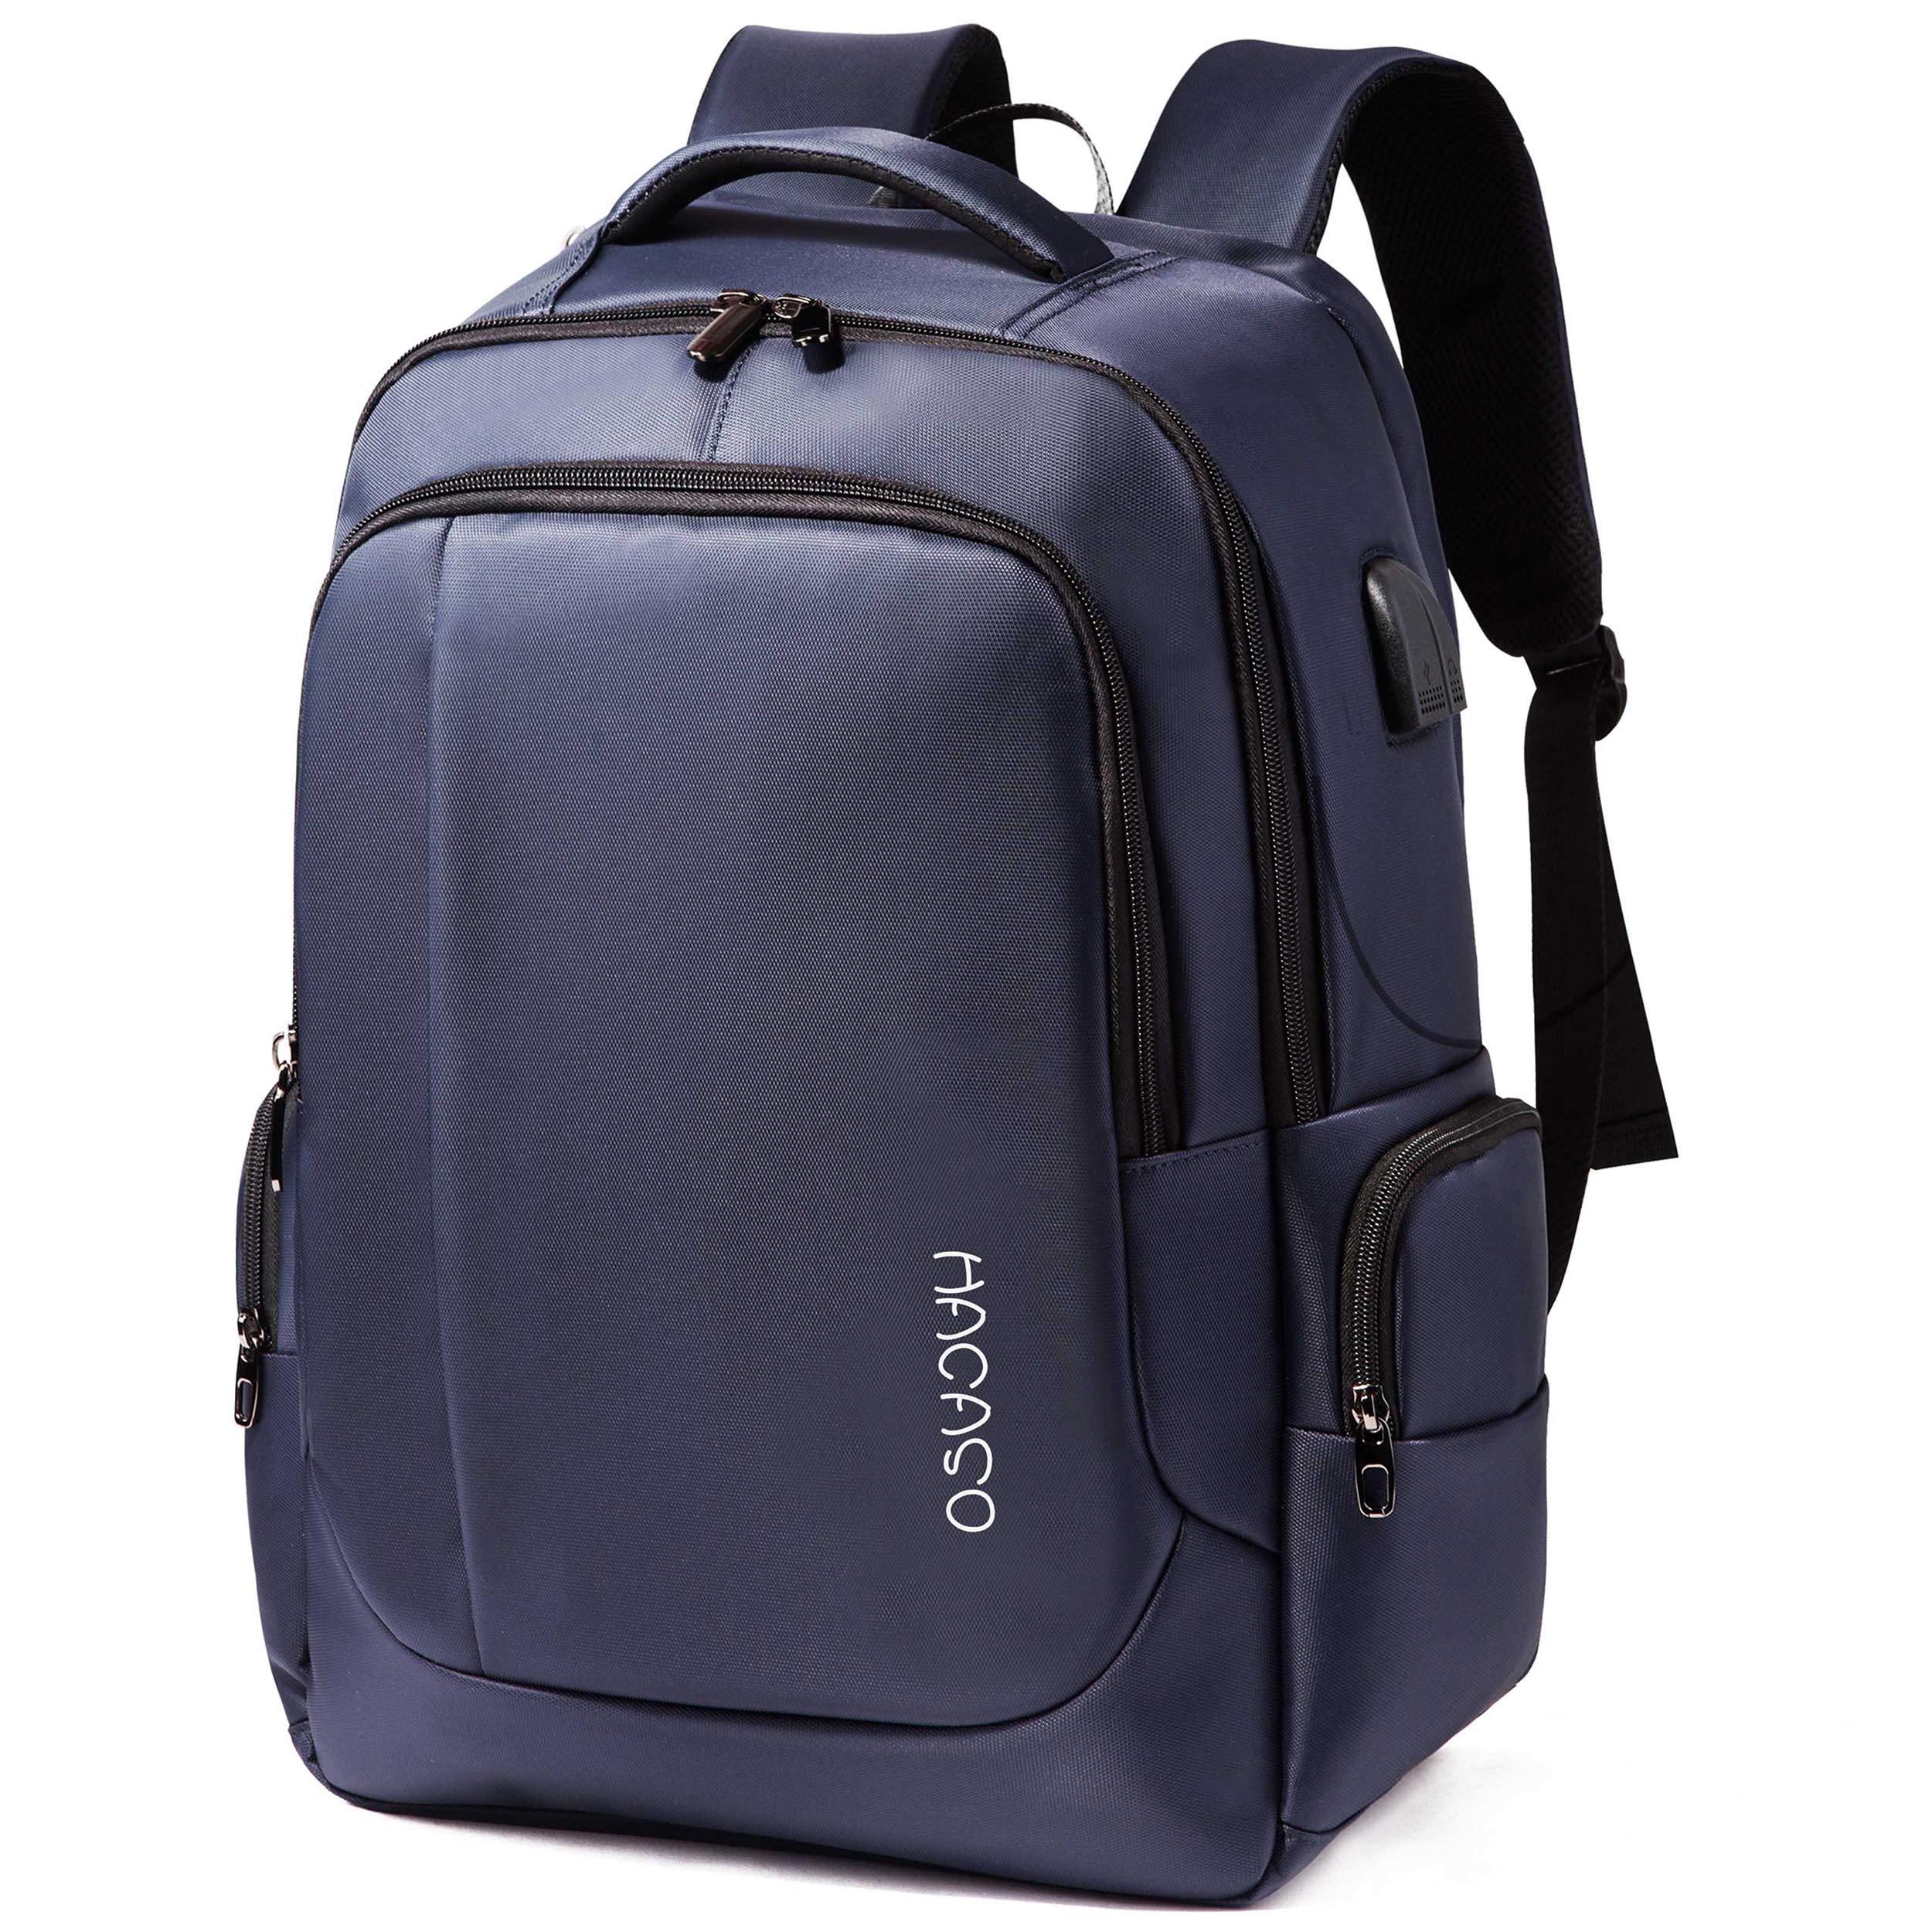 b8da6e1136 Hacaso リュック バックパック ビジネスリュック リュックザック 大容量35L USB ポート搭載 防水 軽量